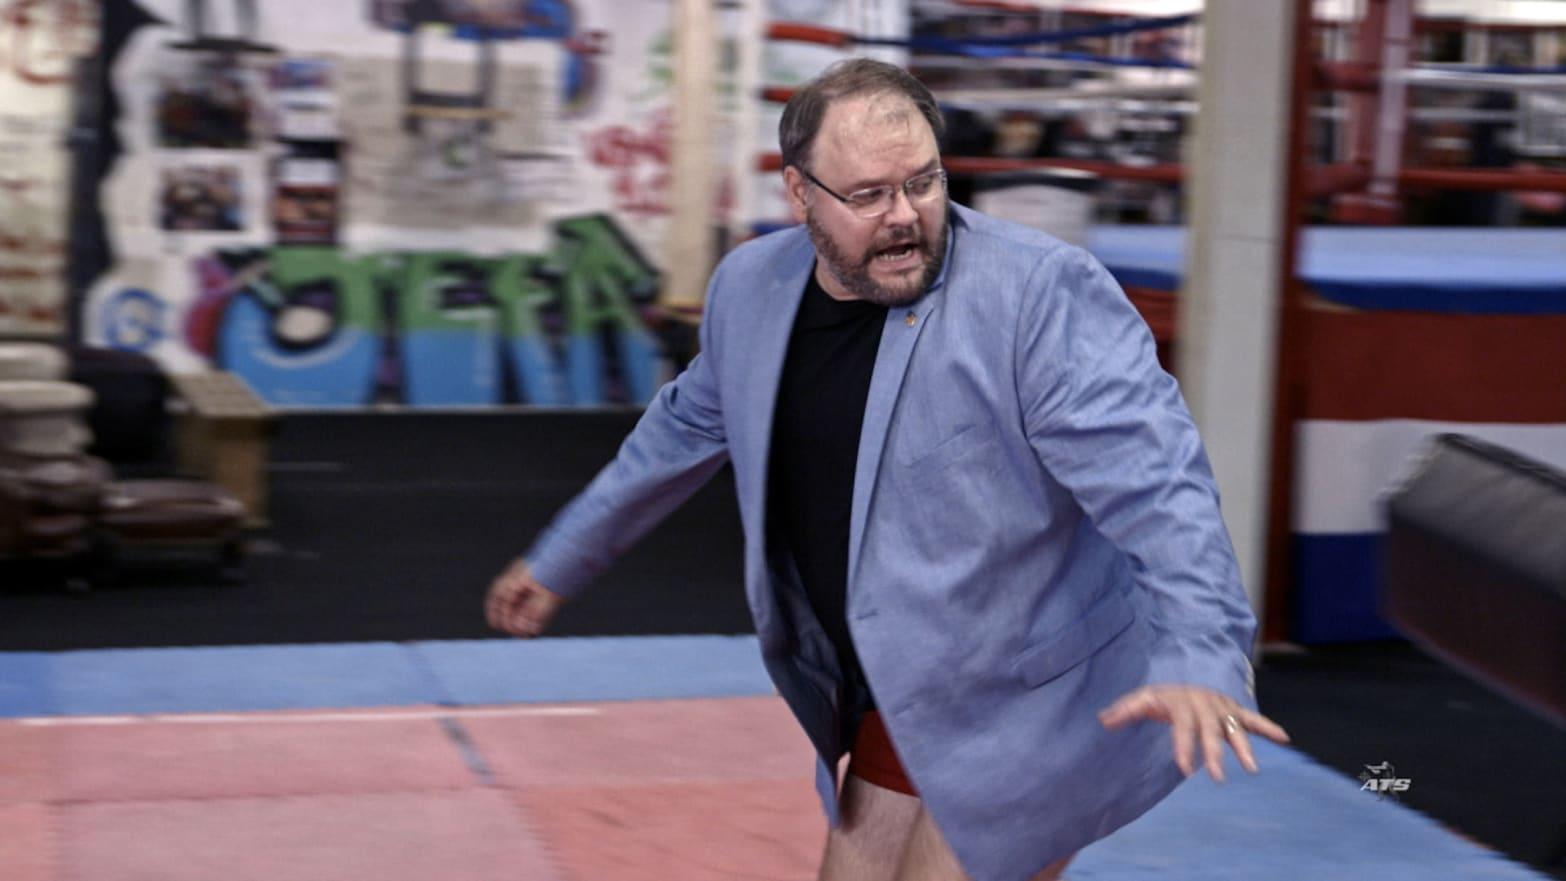 GOP Lawmaker Jason Spencer Strips Down, Screams 'N-Word' on Sacha